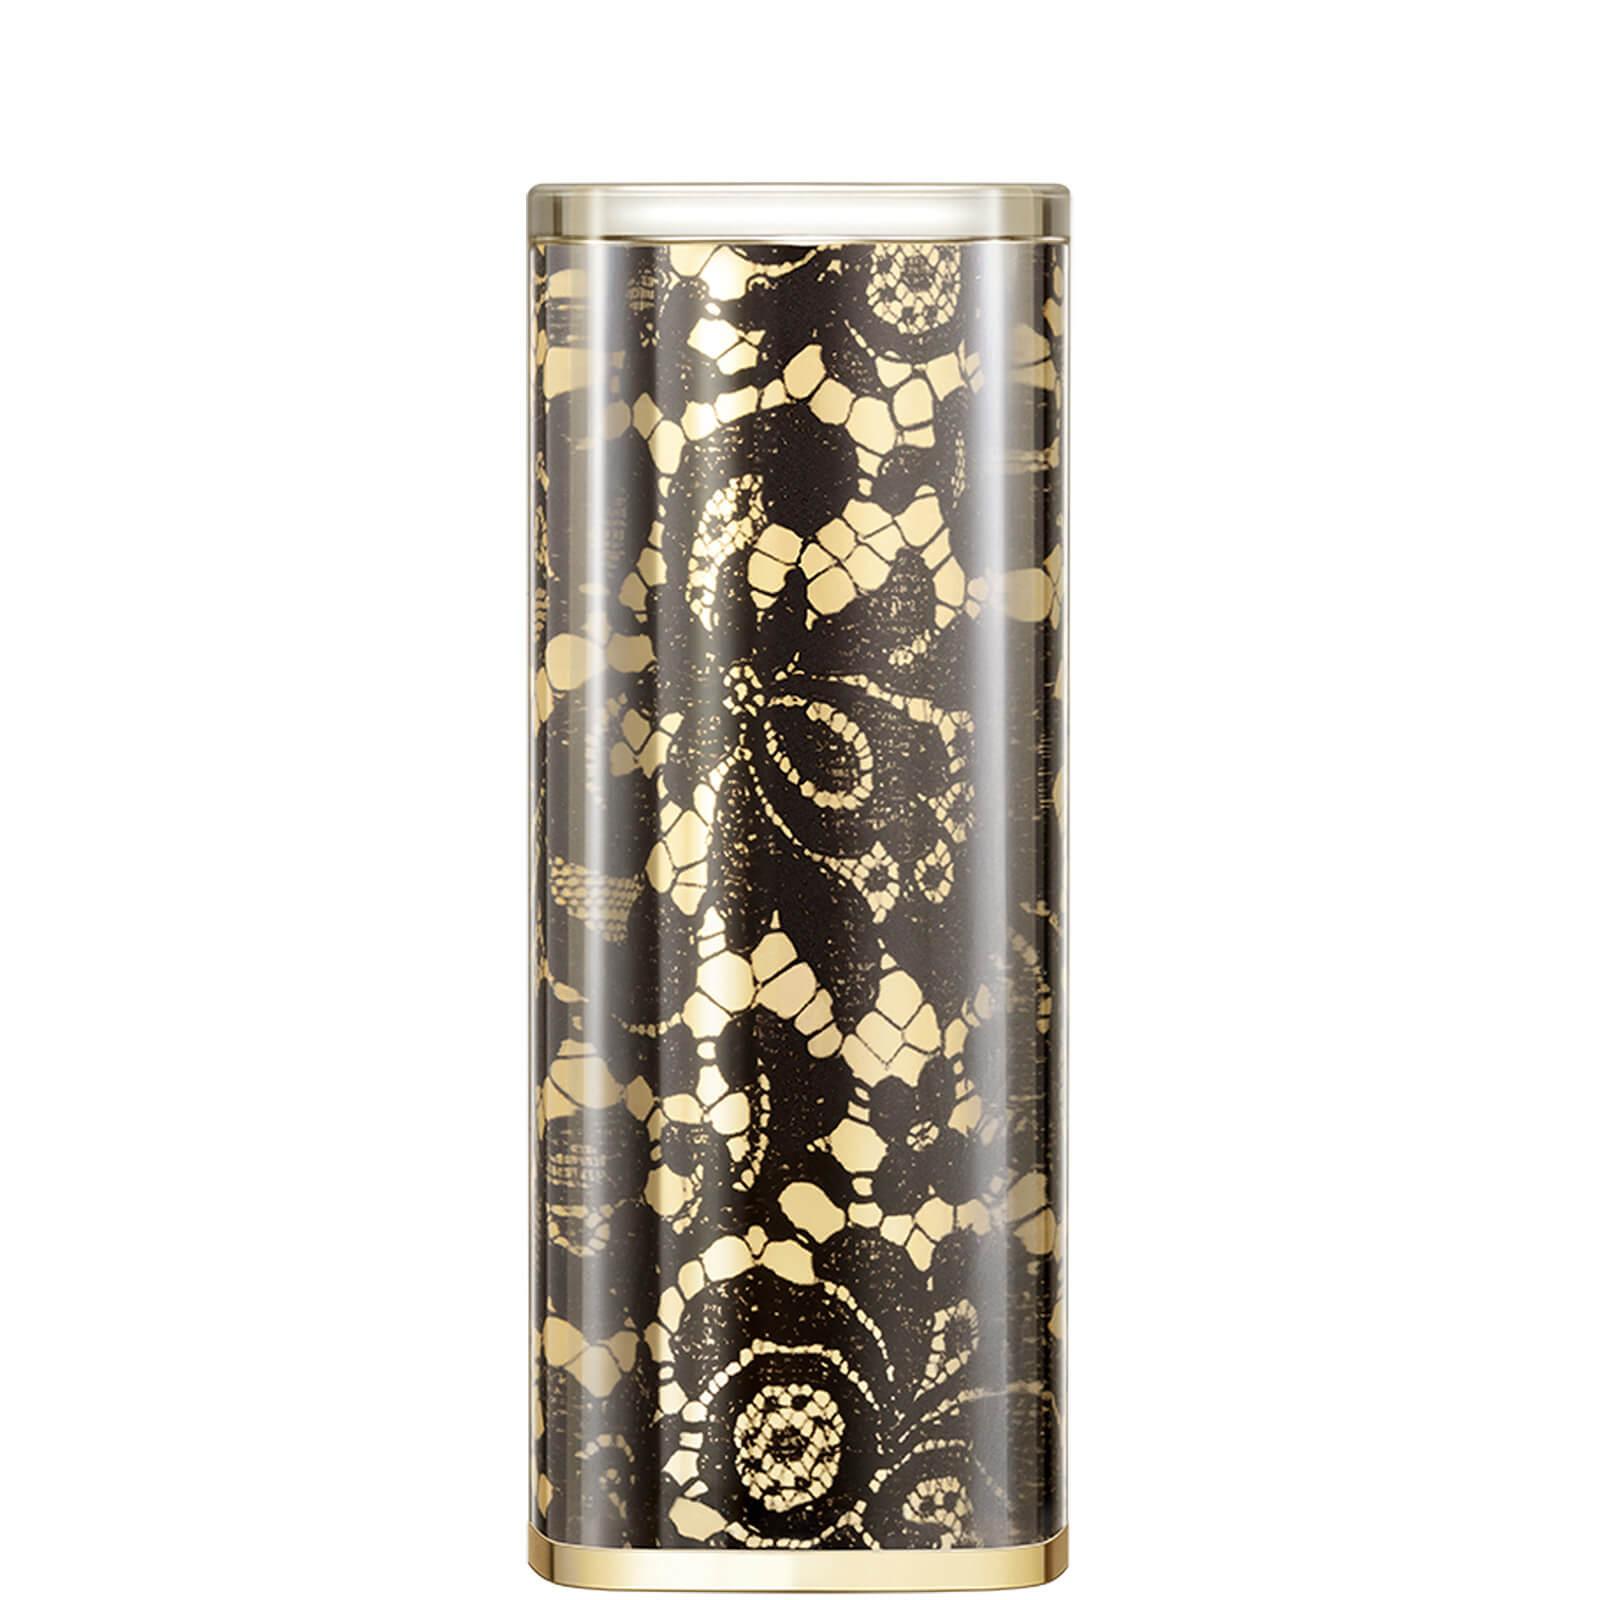 Купить Dolce&Gabbana The Only One Lipstick Cap - Lace